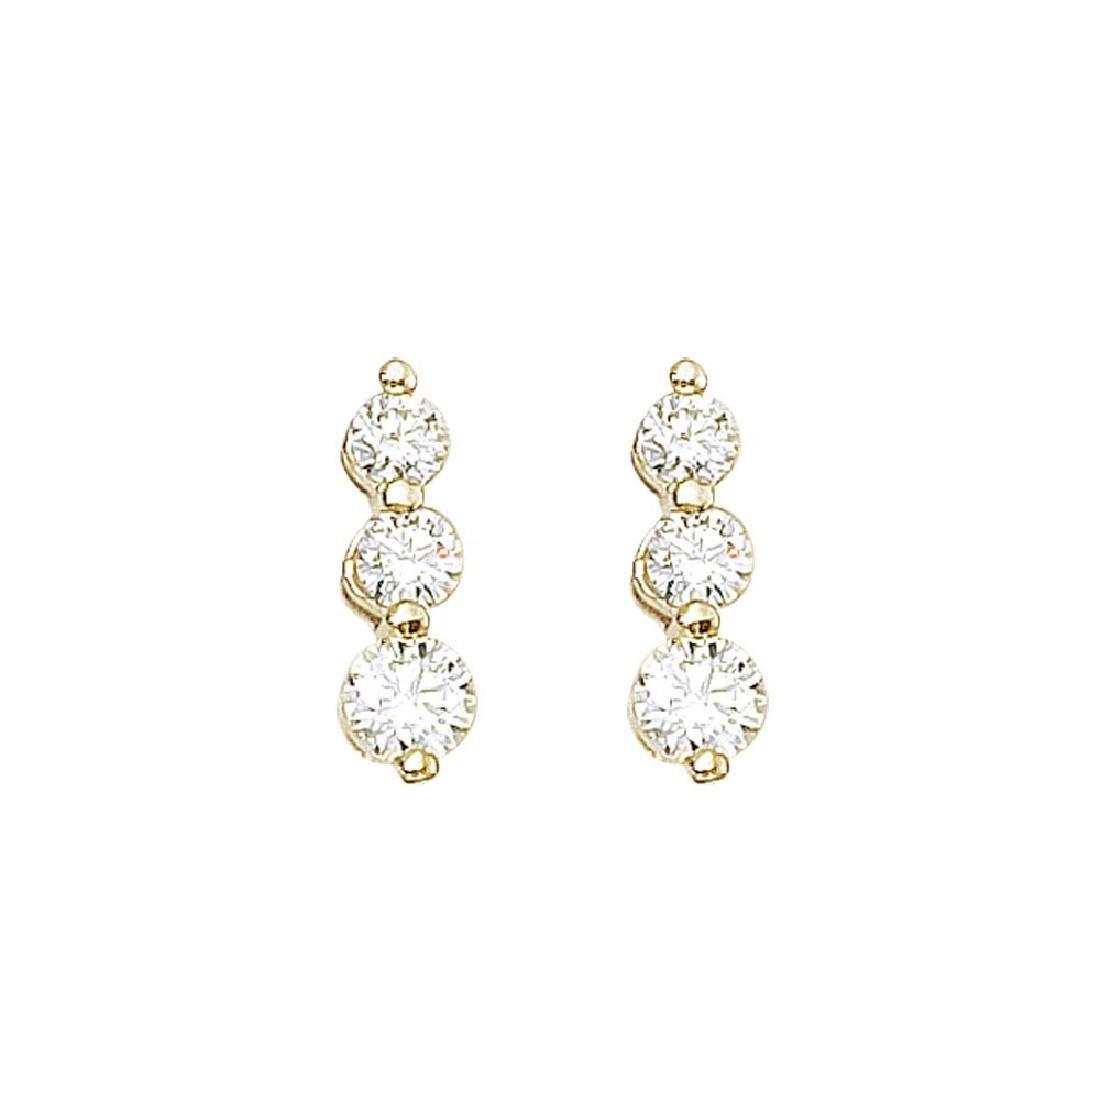 Certified 14k Yellow Gold 1 ct 3 Stone Diamond Earring